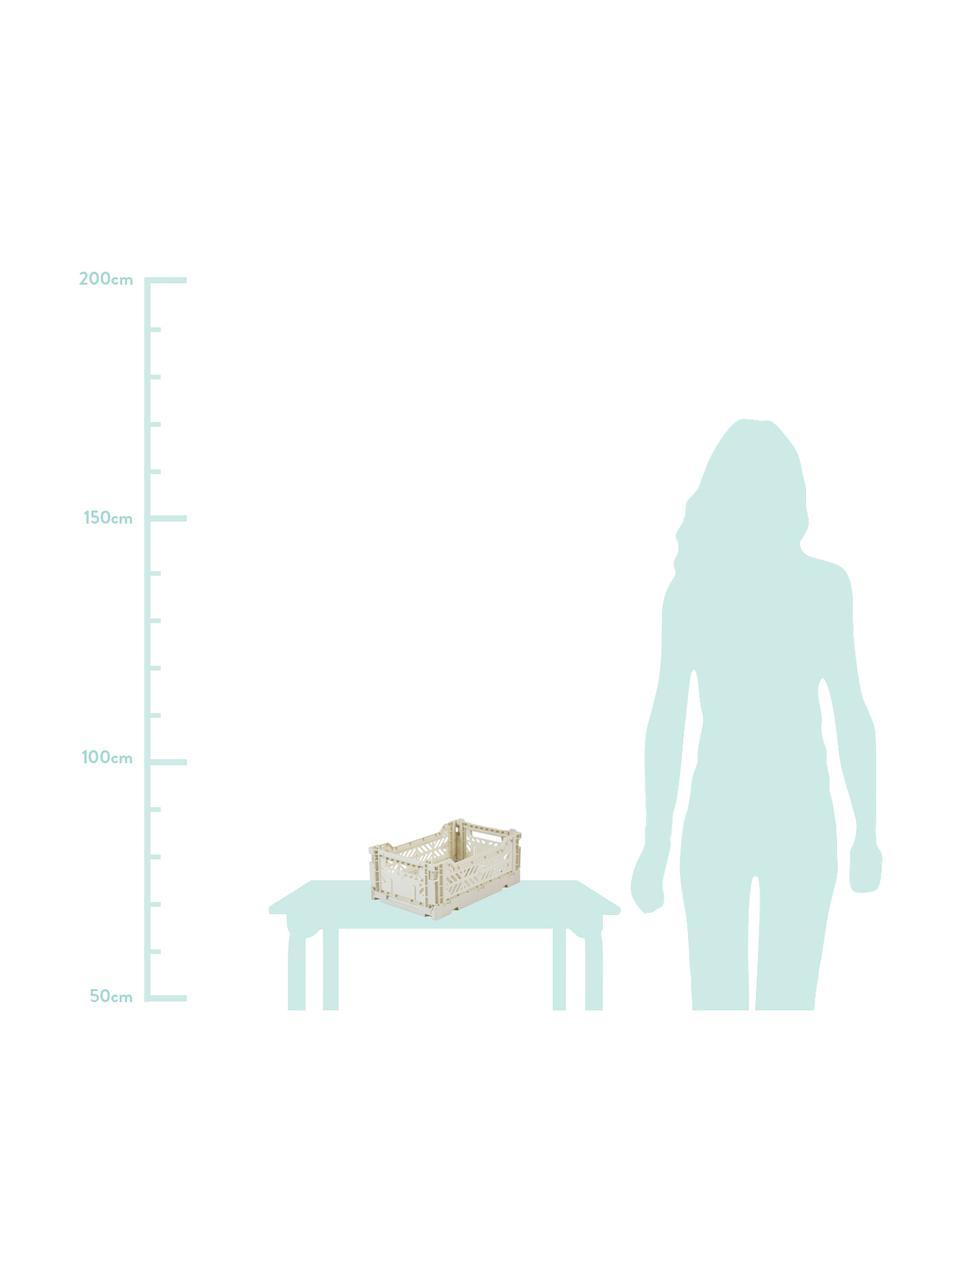 Skládací box Coconut Milk, stohovatelný, malý, Tlumená bílá